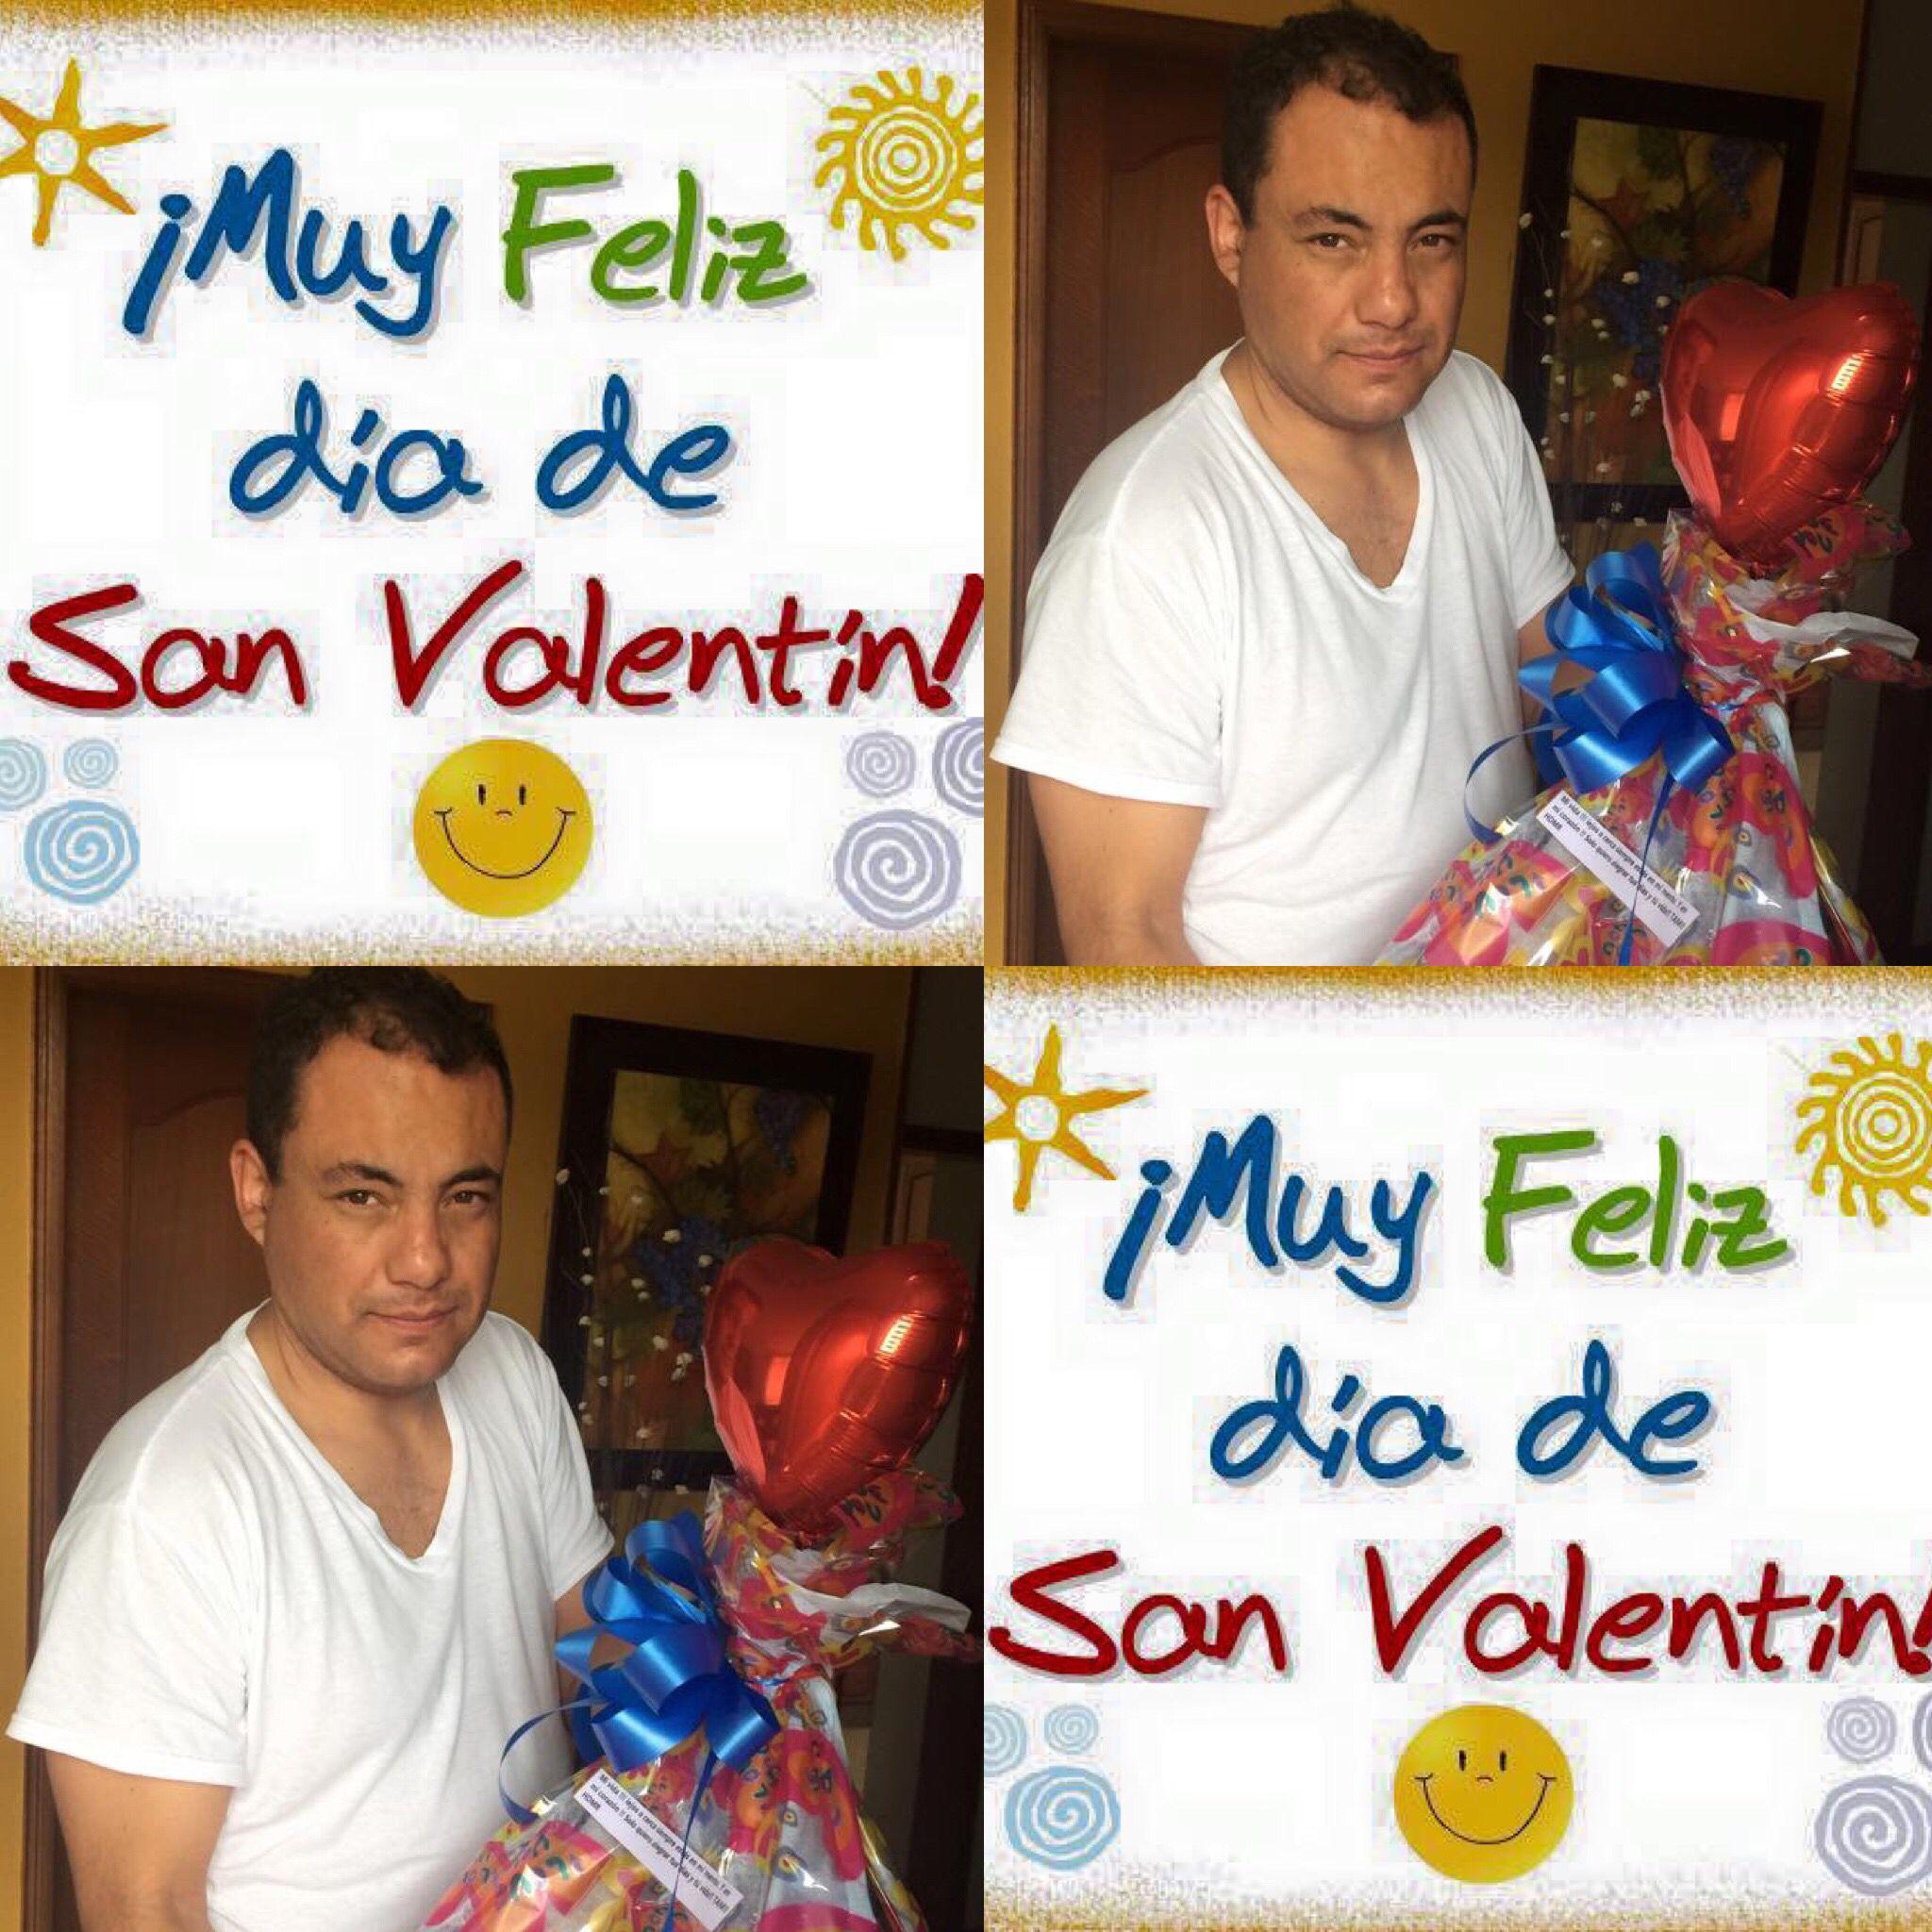 Feliz Día de San Valentín!  UN DULCE DESPERTAR SABANA